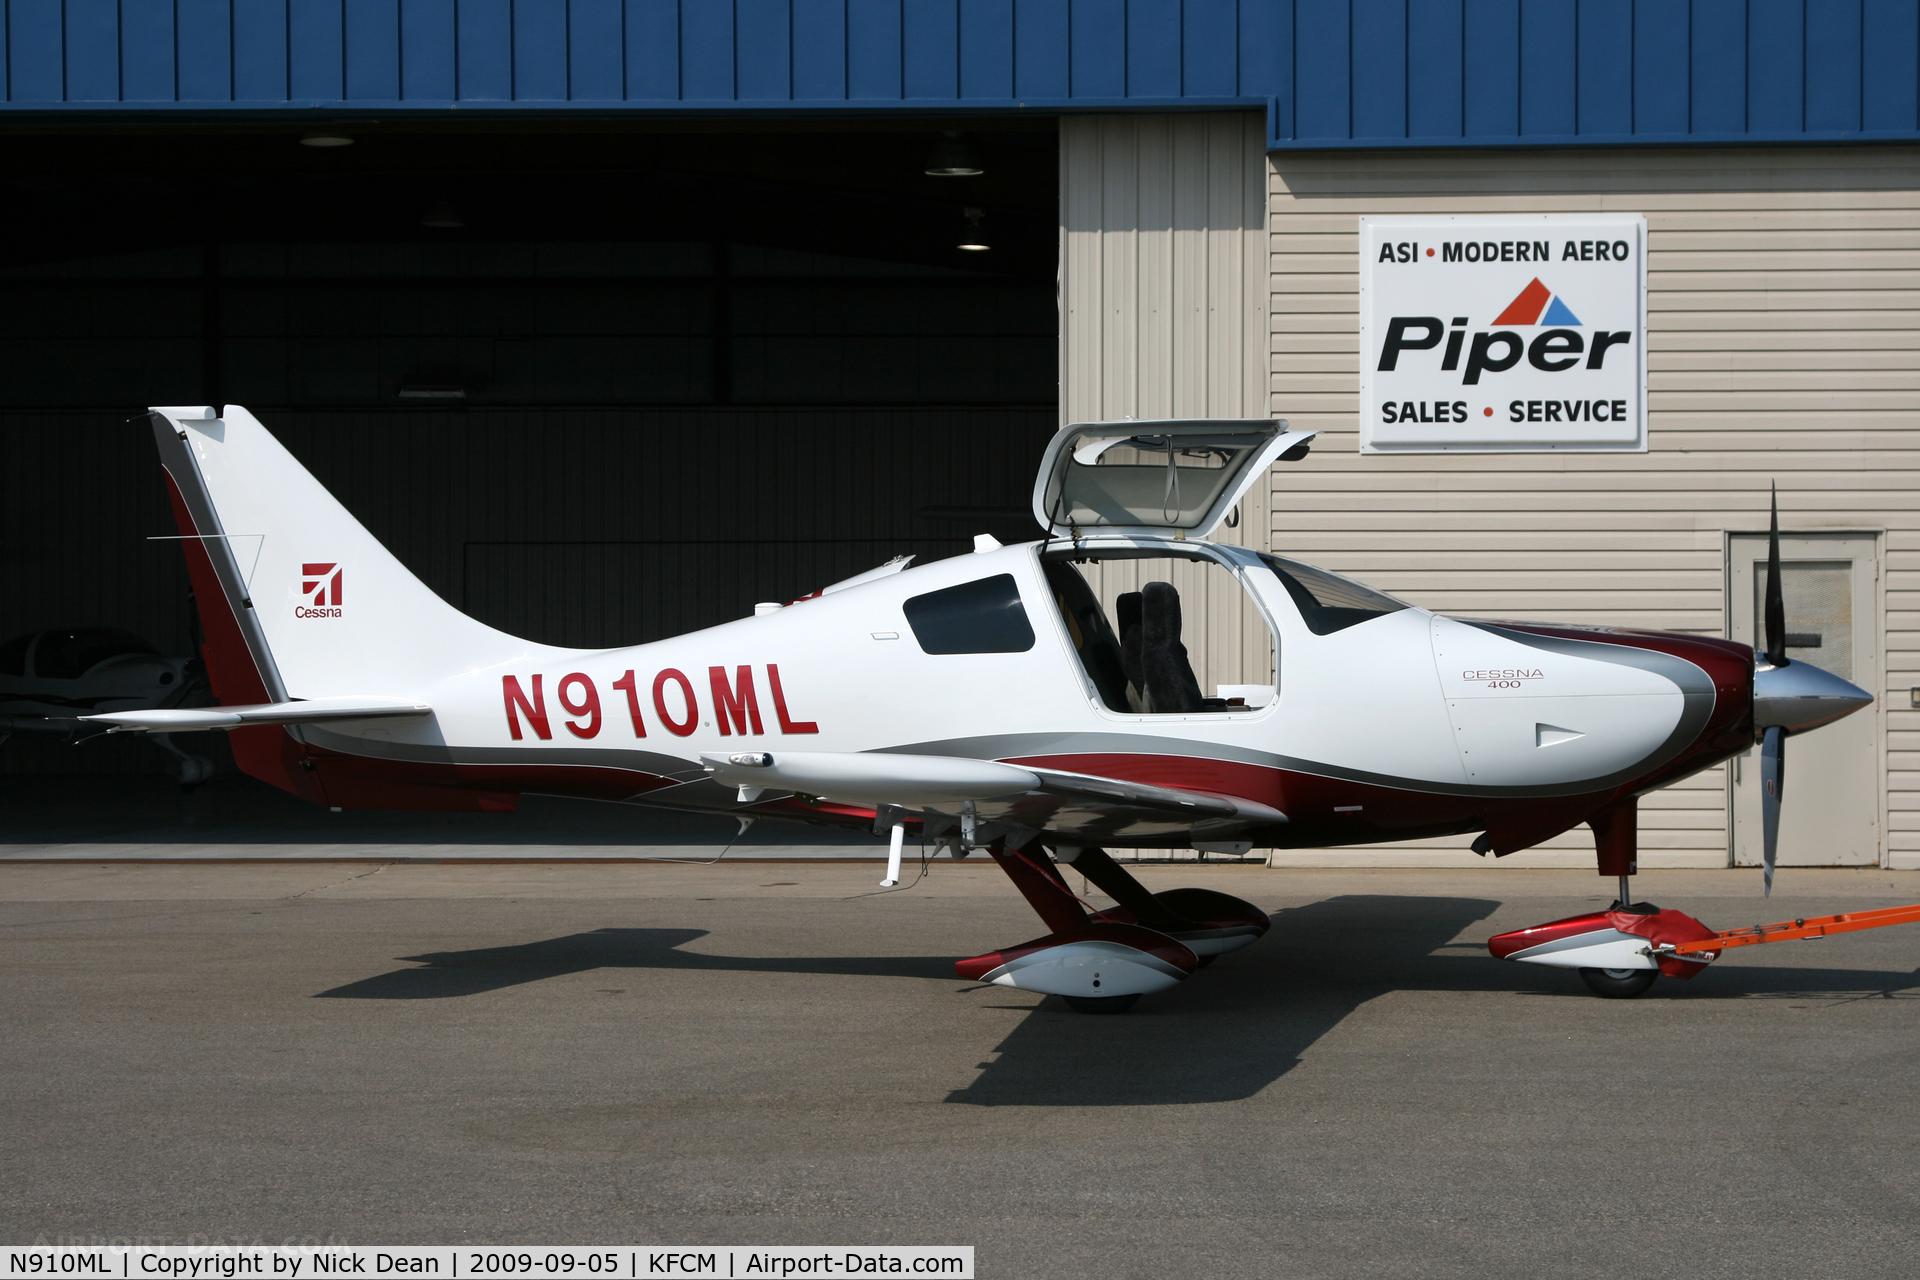 N910ML, 2008 Cessna LC41-550FG C/N 411031, KFCM